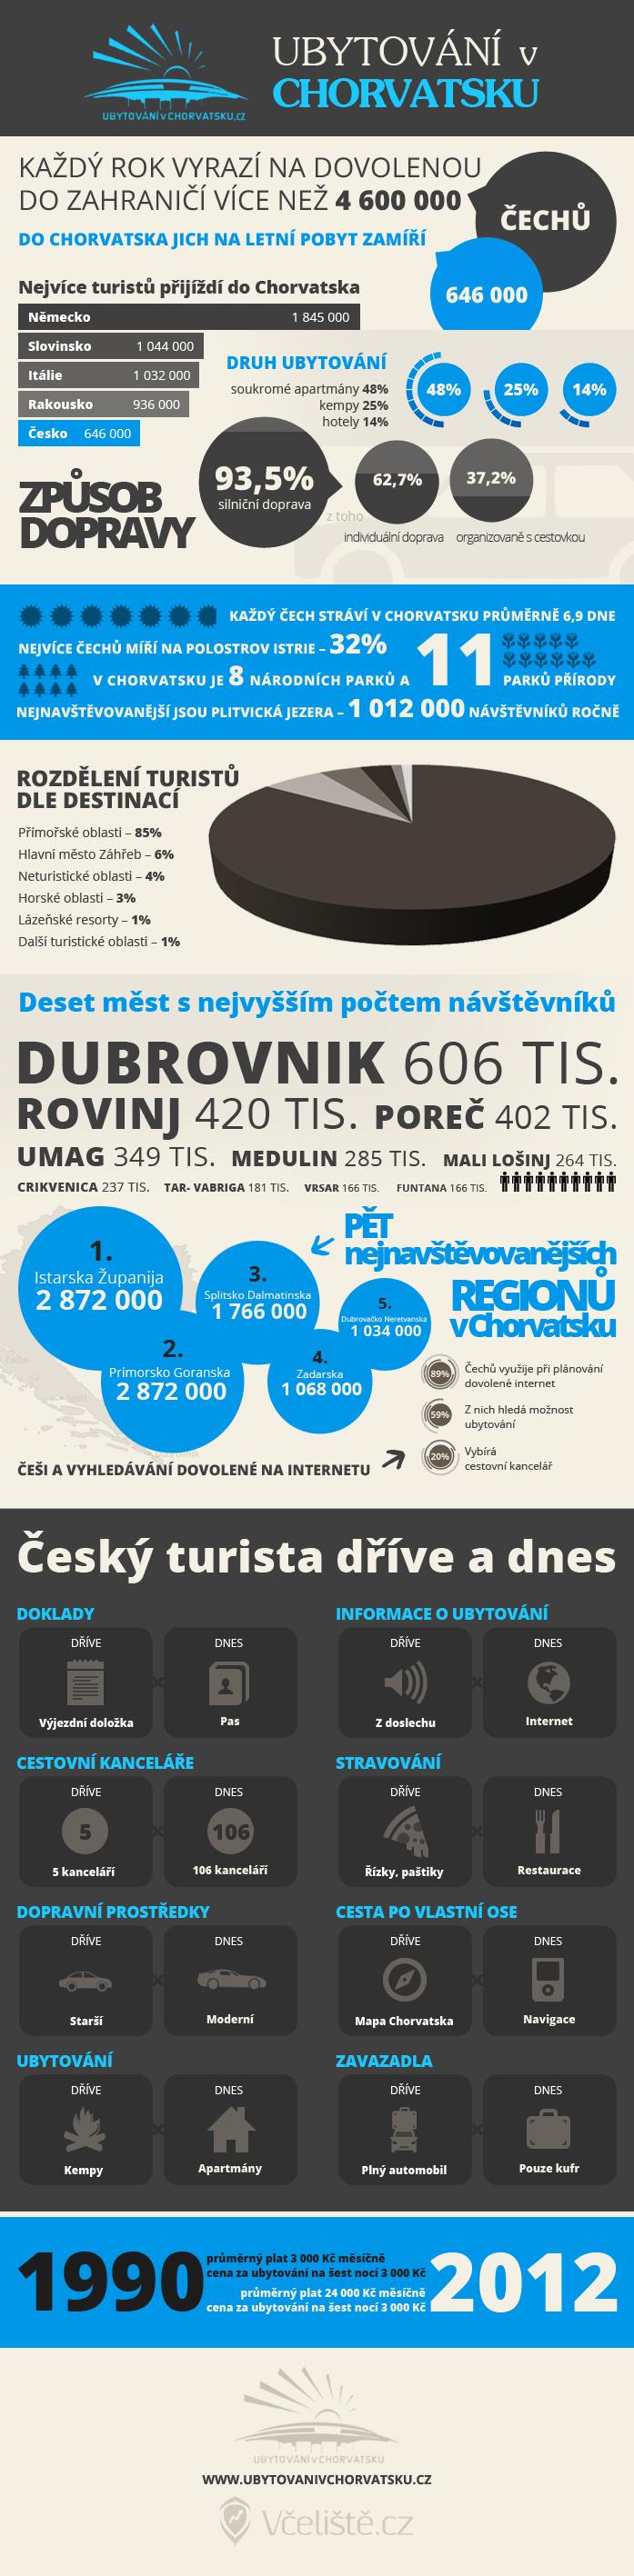 infografika_chorvatsko